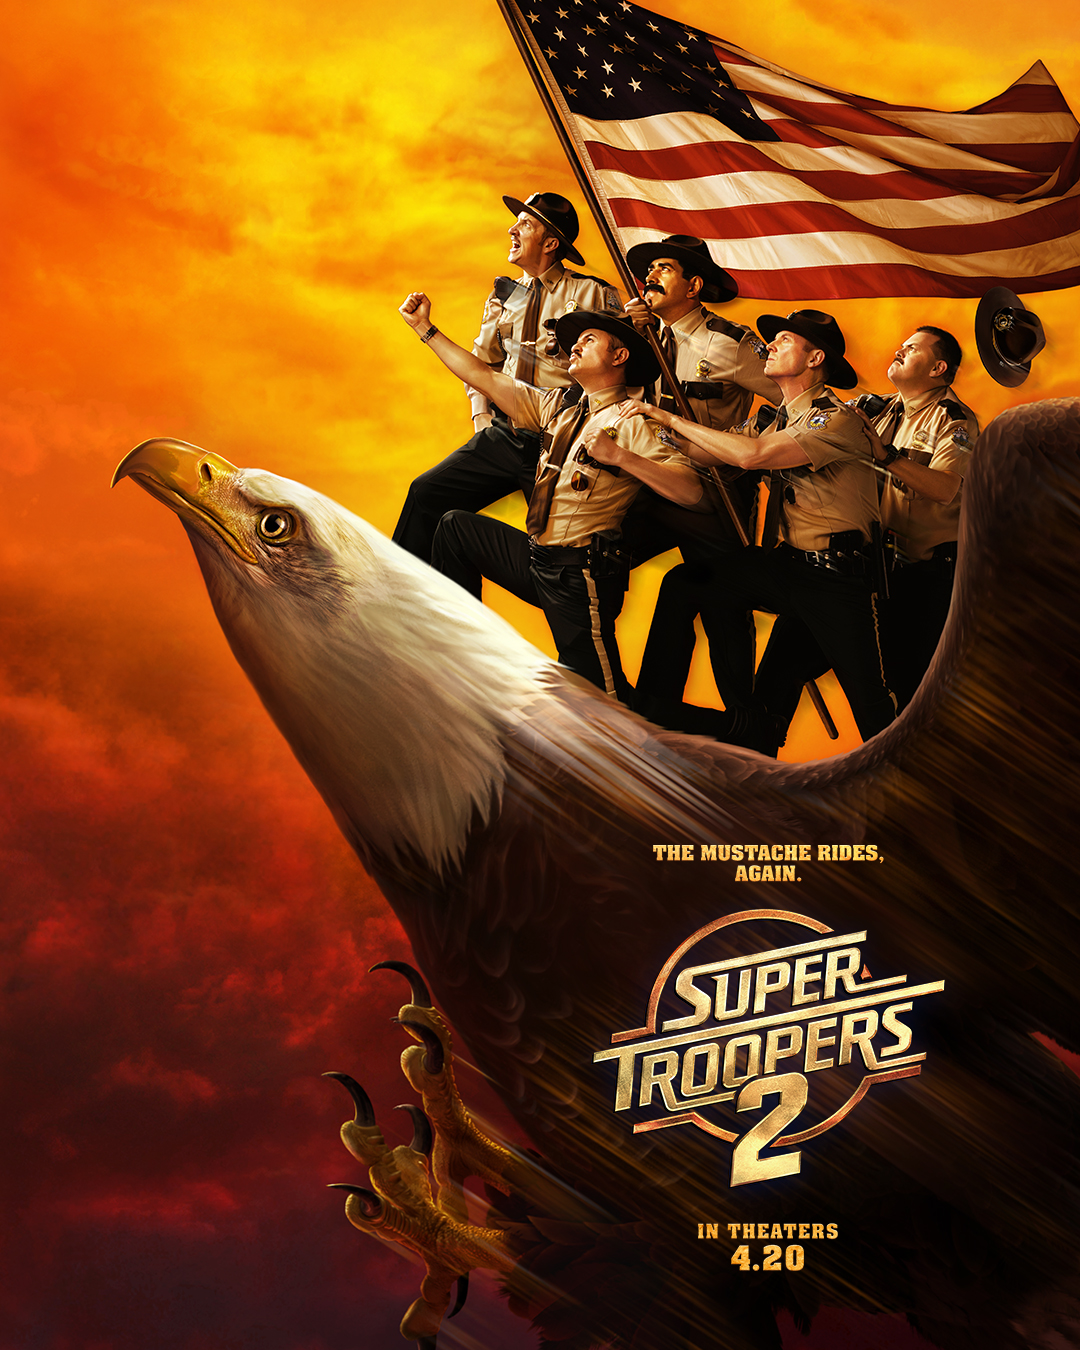 Super Troopers 2 (2018) BluRay 480p, 720p & 1080p